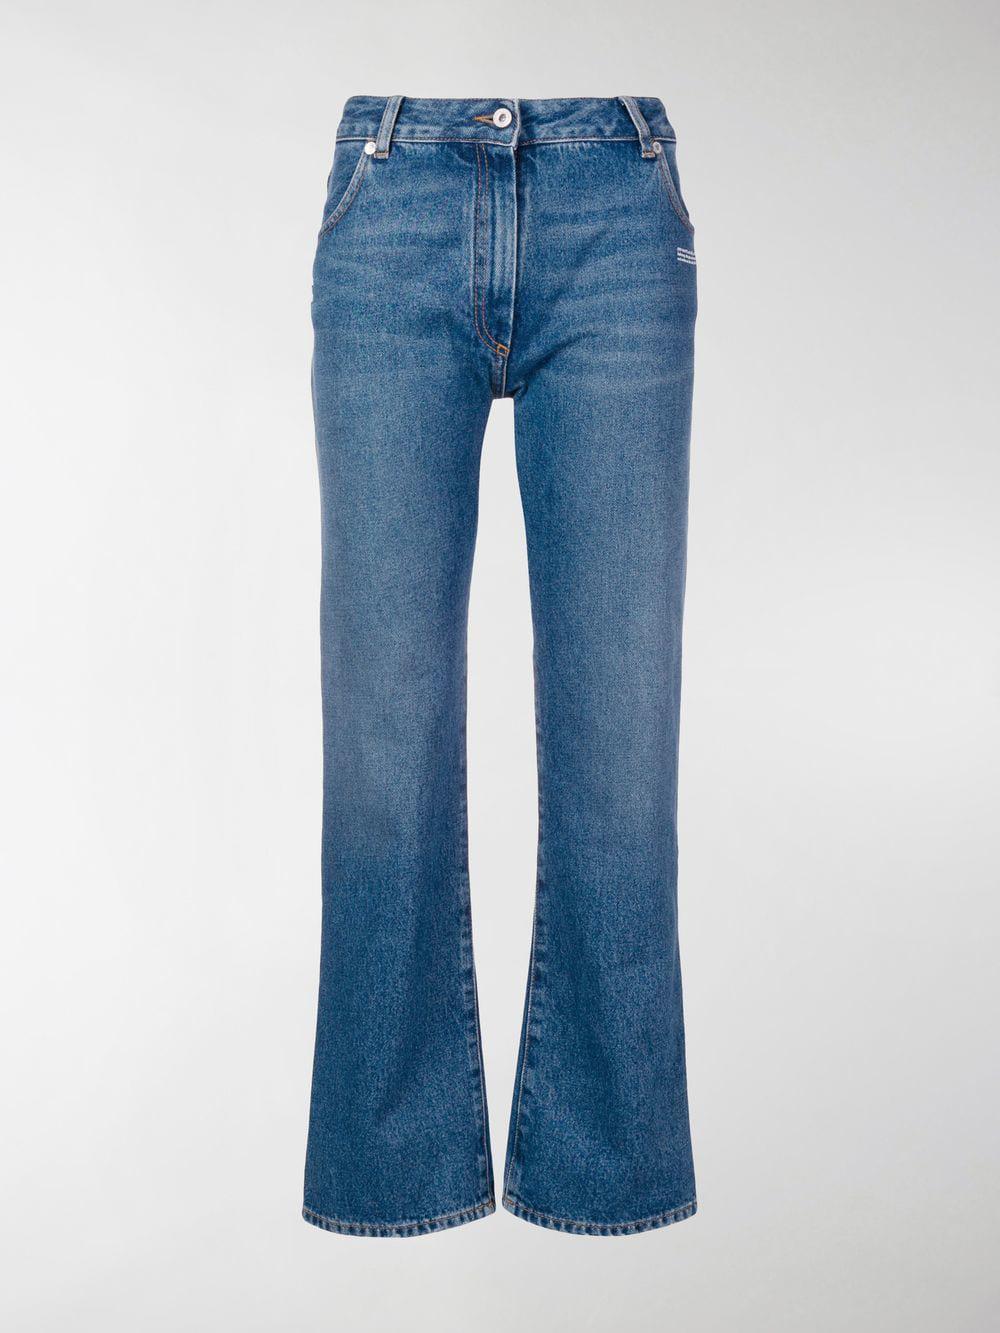 a456b2435b5c Off-White C O Virgil Abloh Regular Fit Jeans in Blue - Lyst